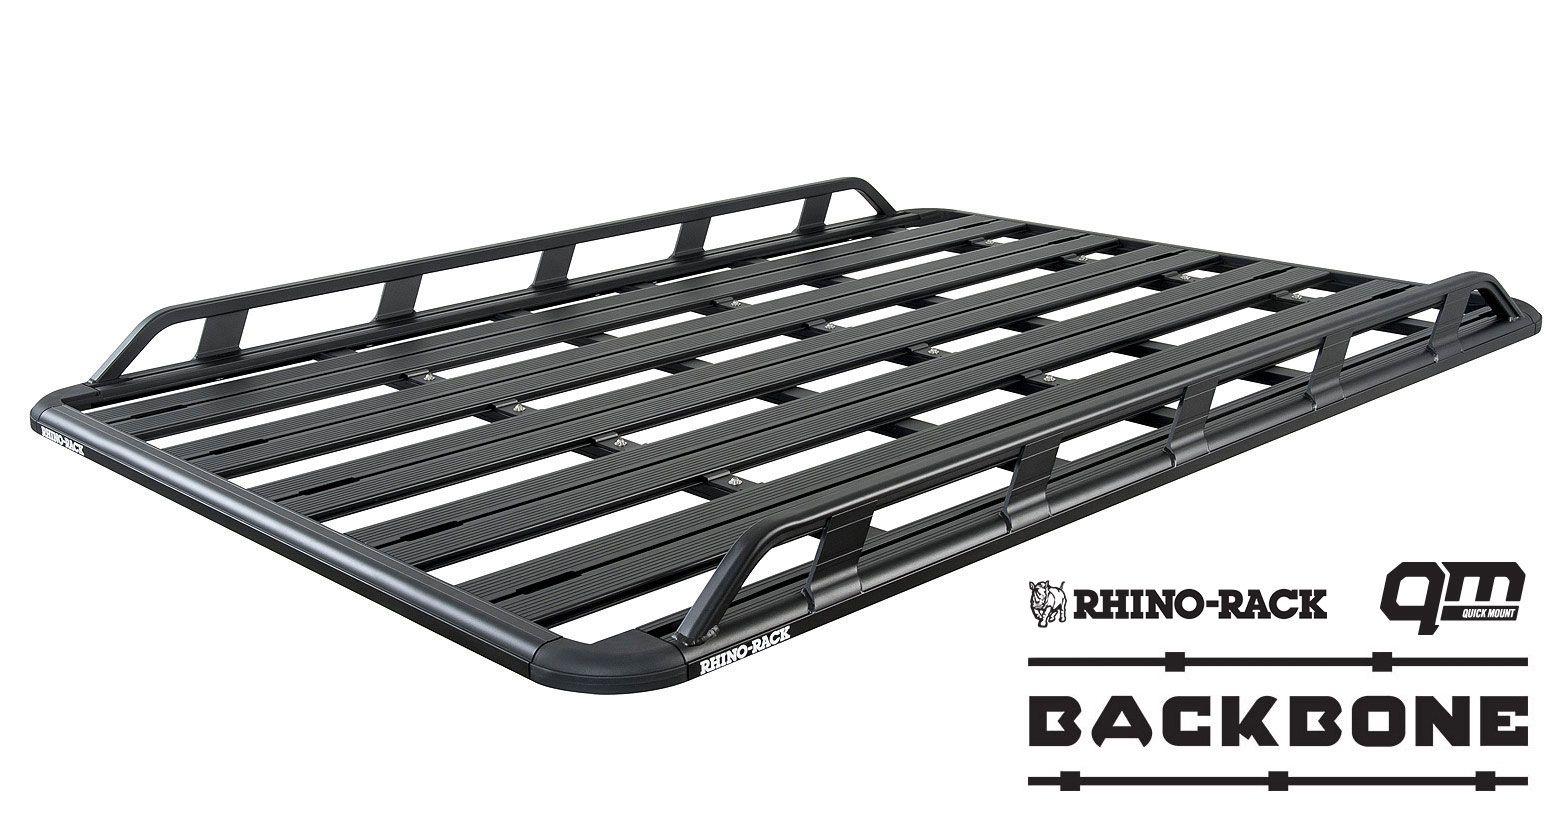 The Pioneer Elevation With Rhino Rack Backbone